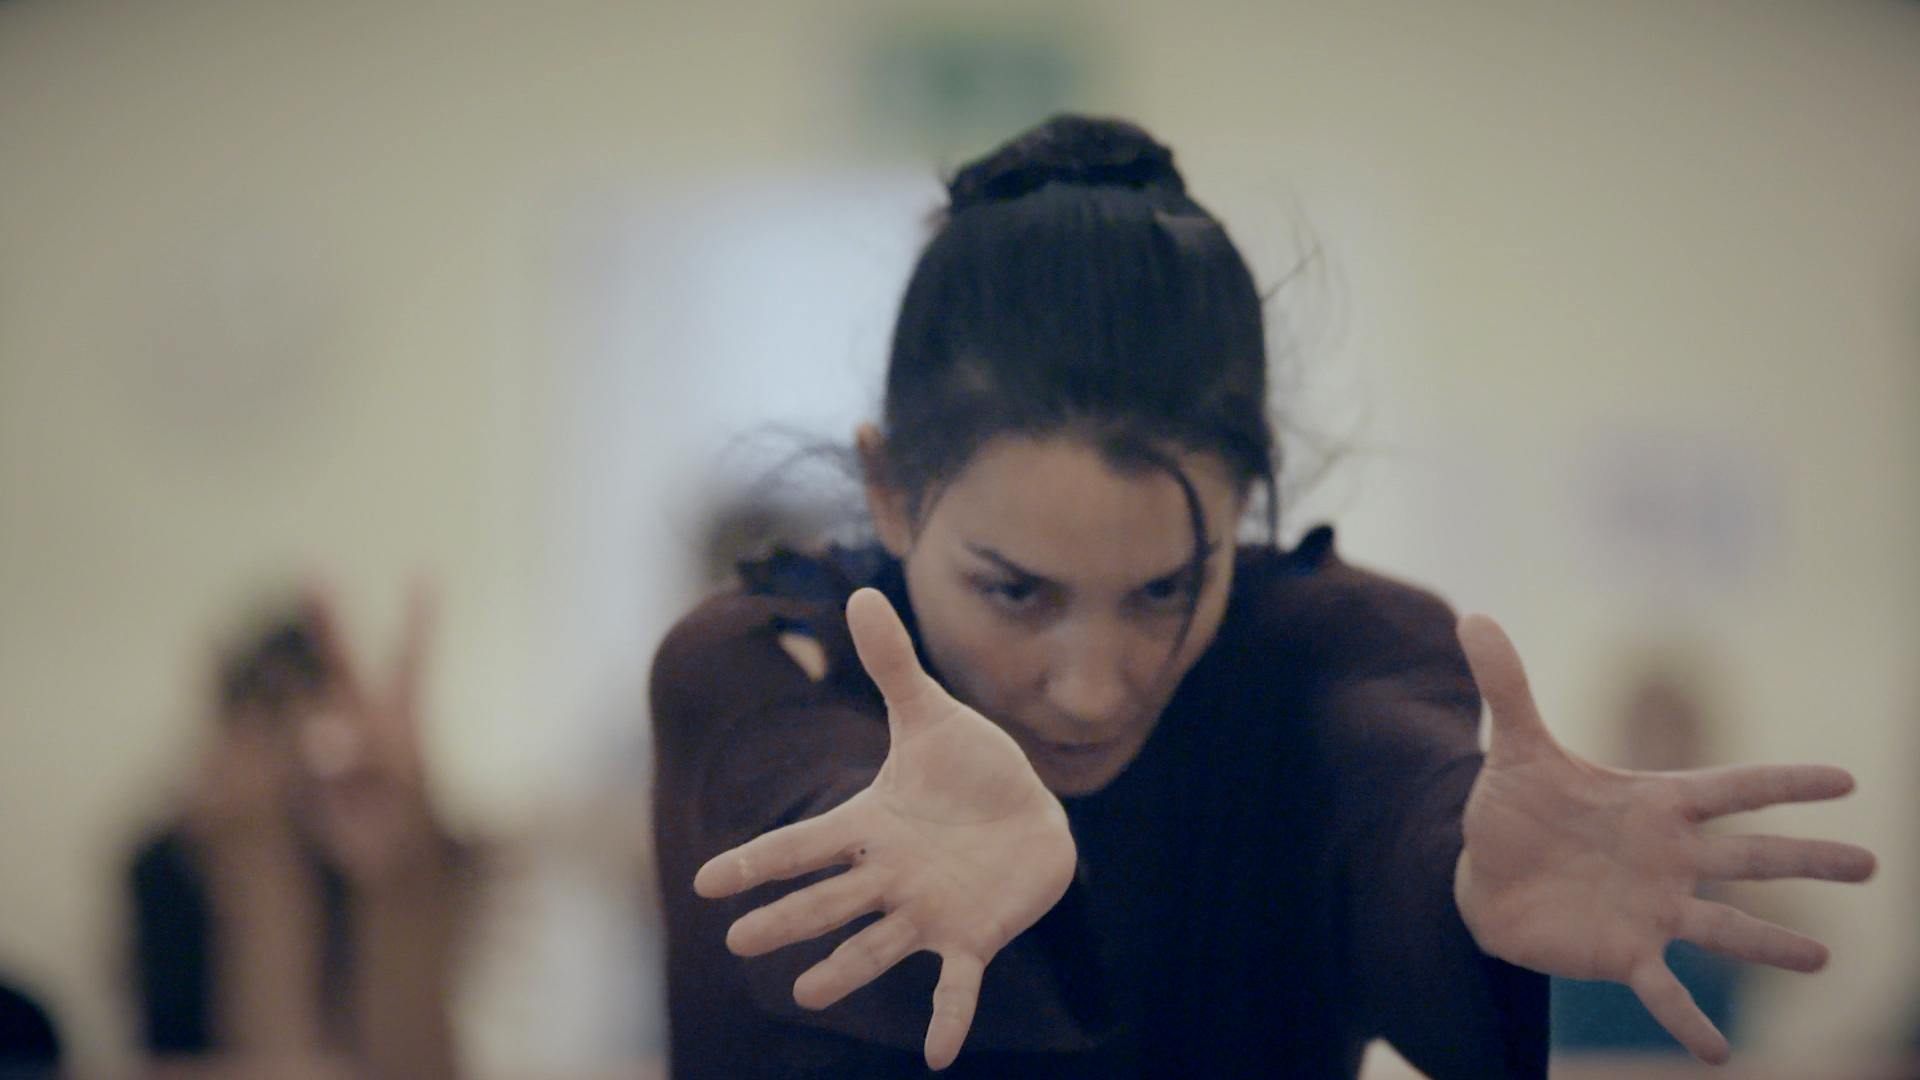 Ballet meets kathak: the traditions behind Akram Khan's Giselle | English National Ballet